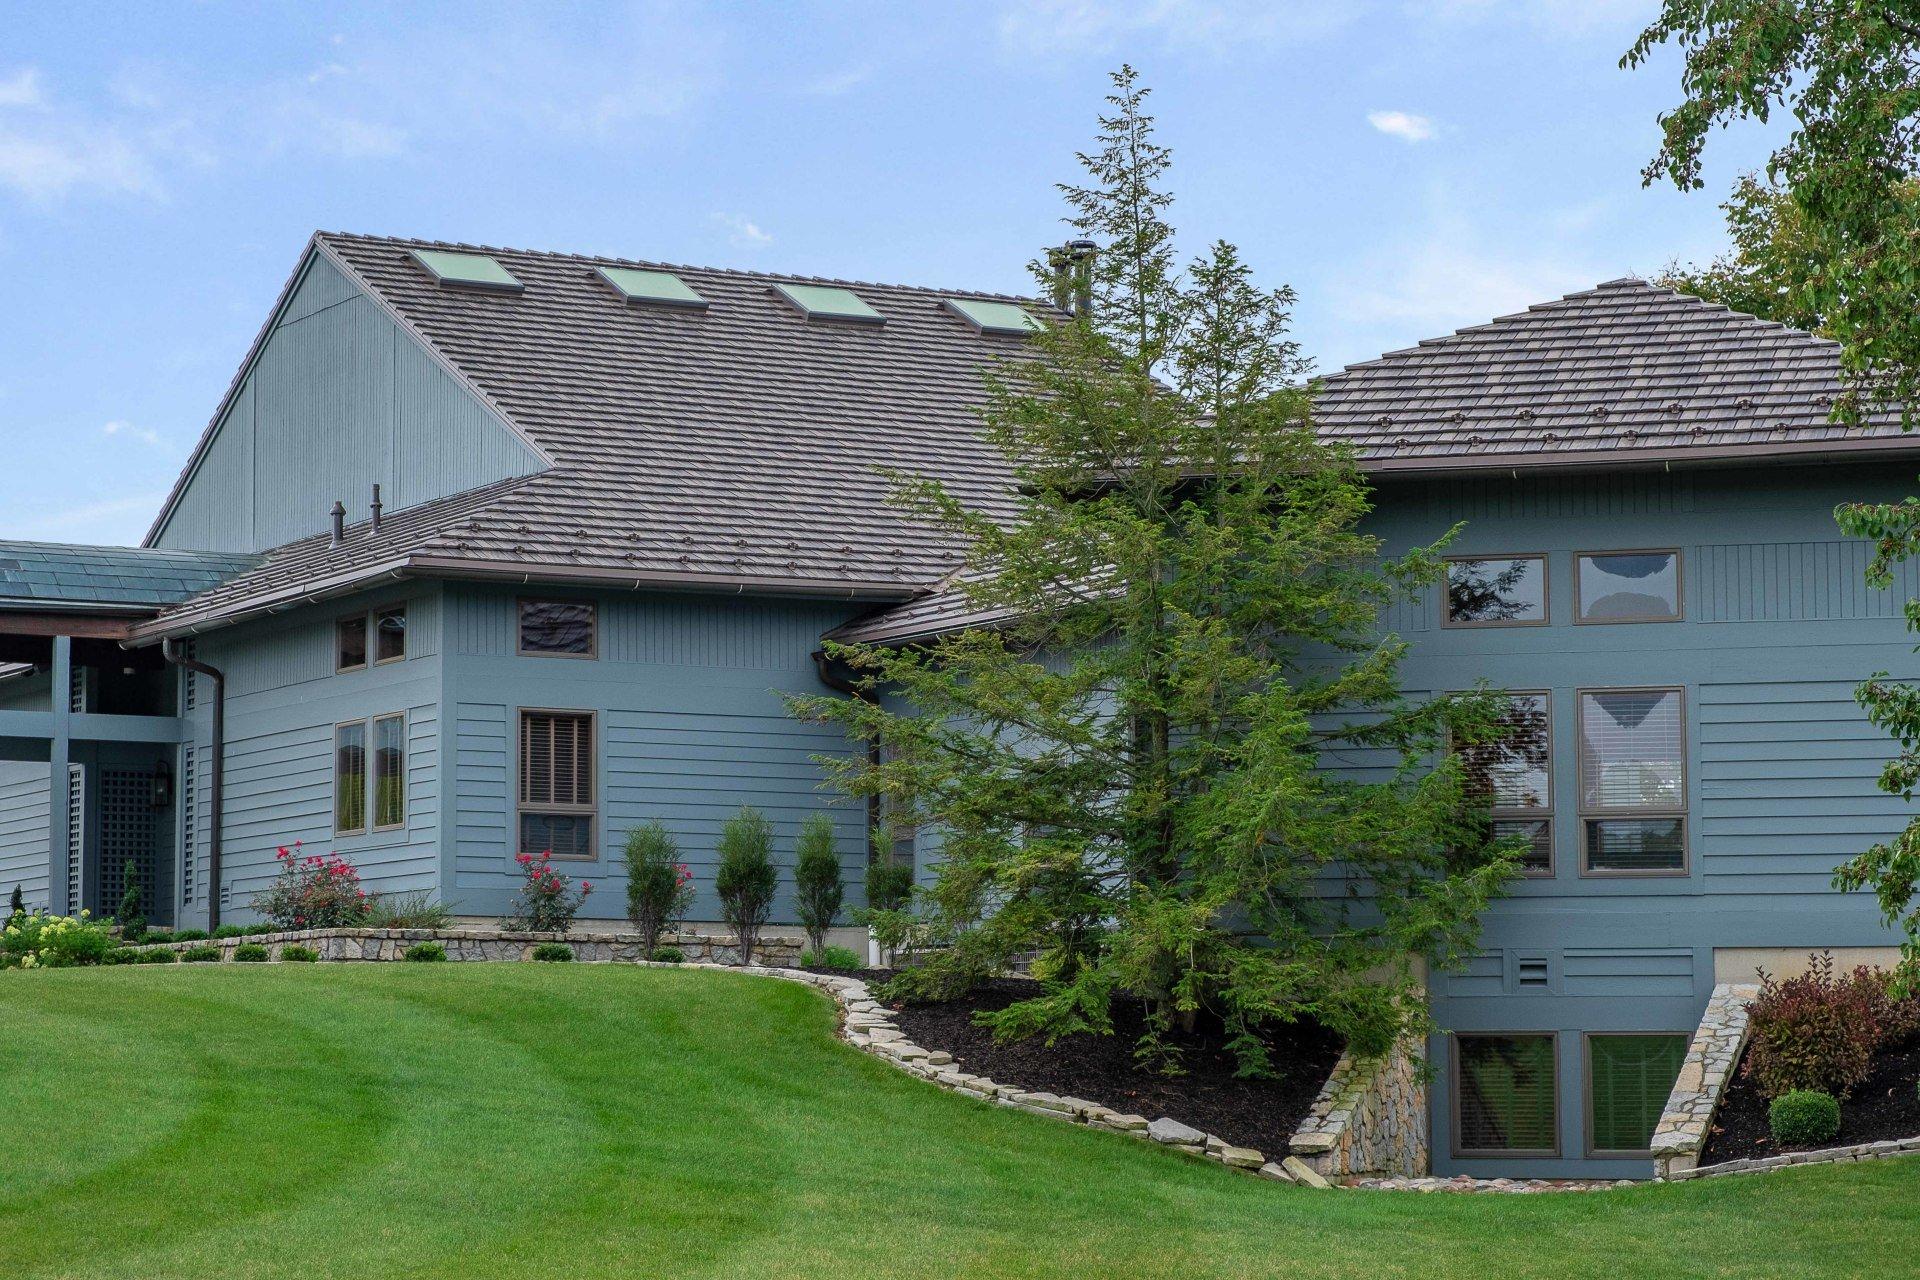 New Hampshire Metal Roofing Auburn Me New Hampshire